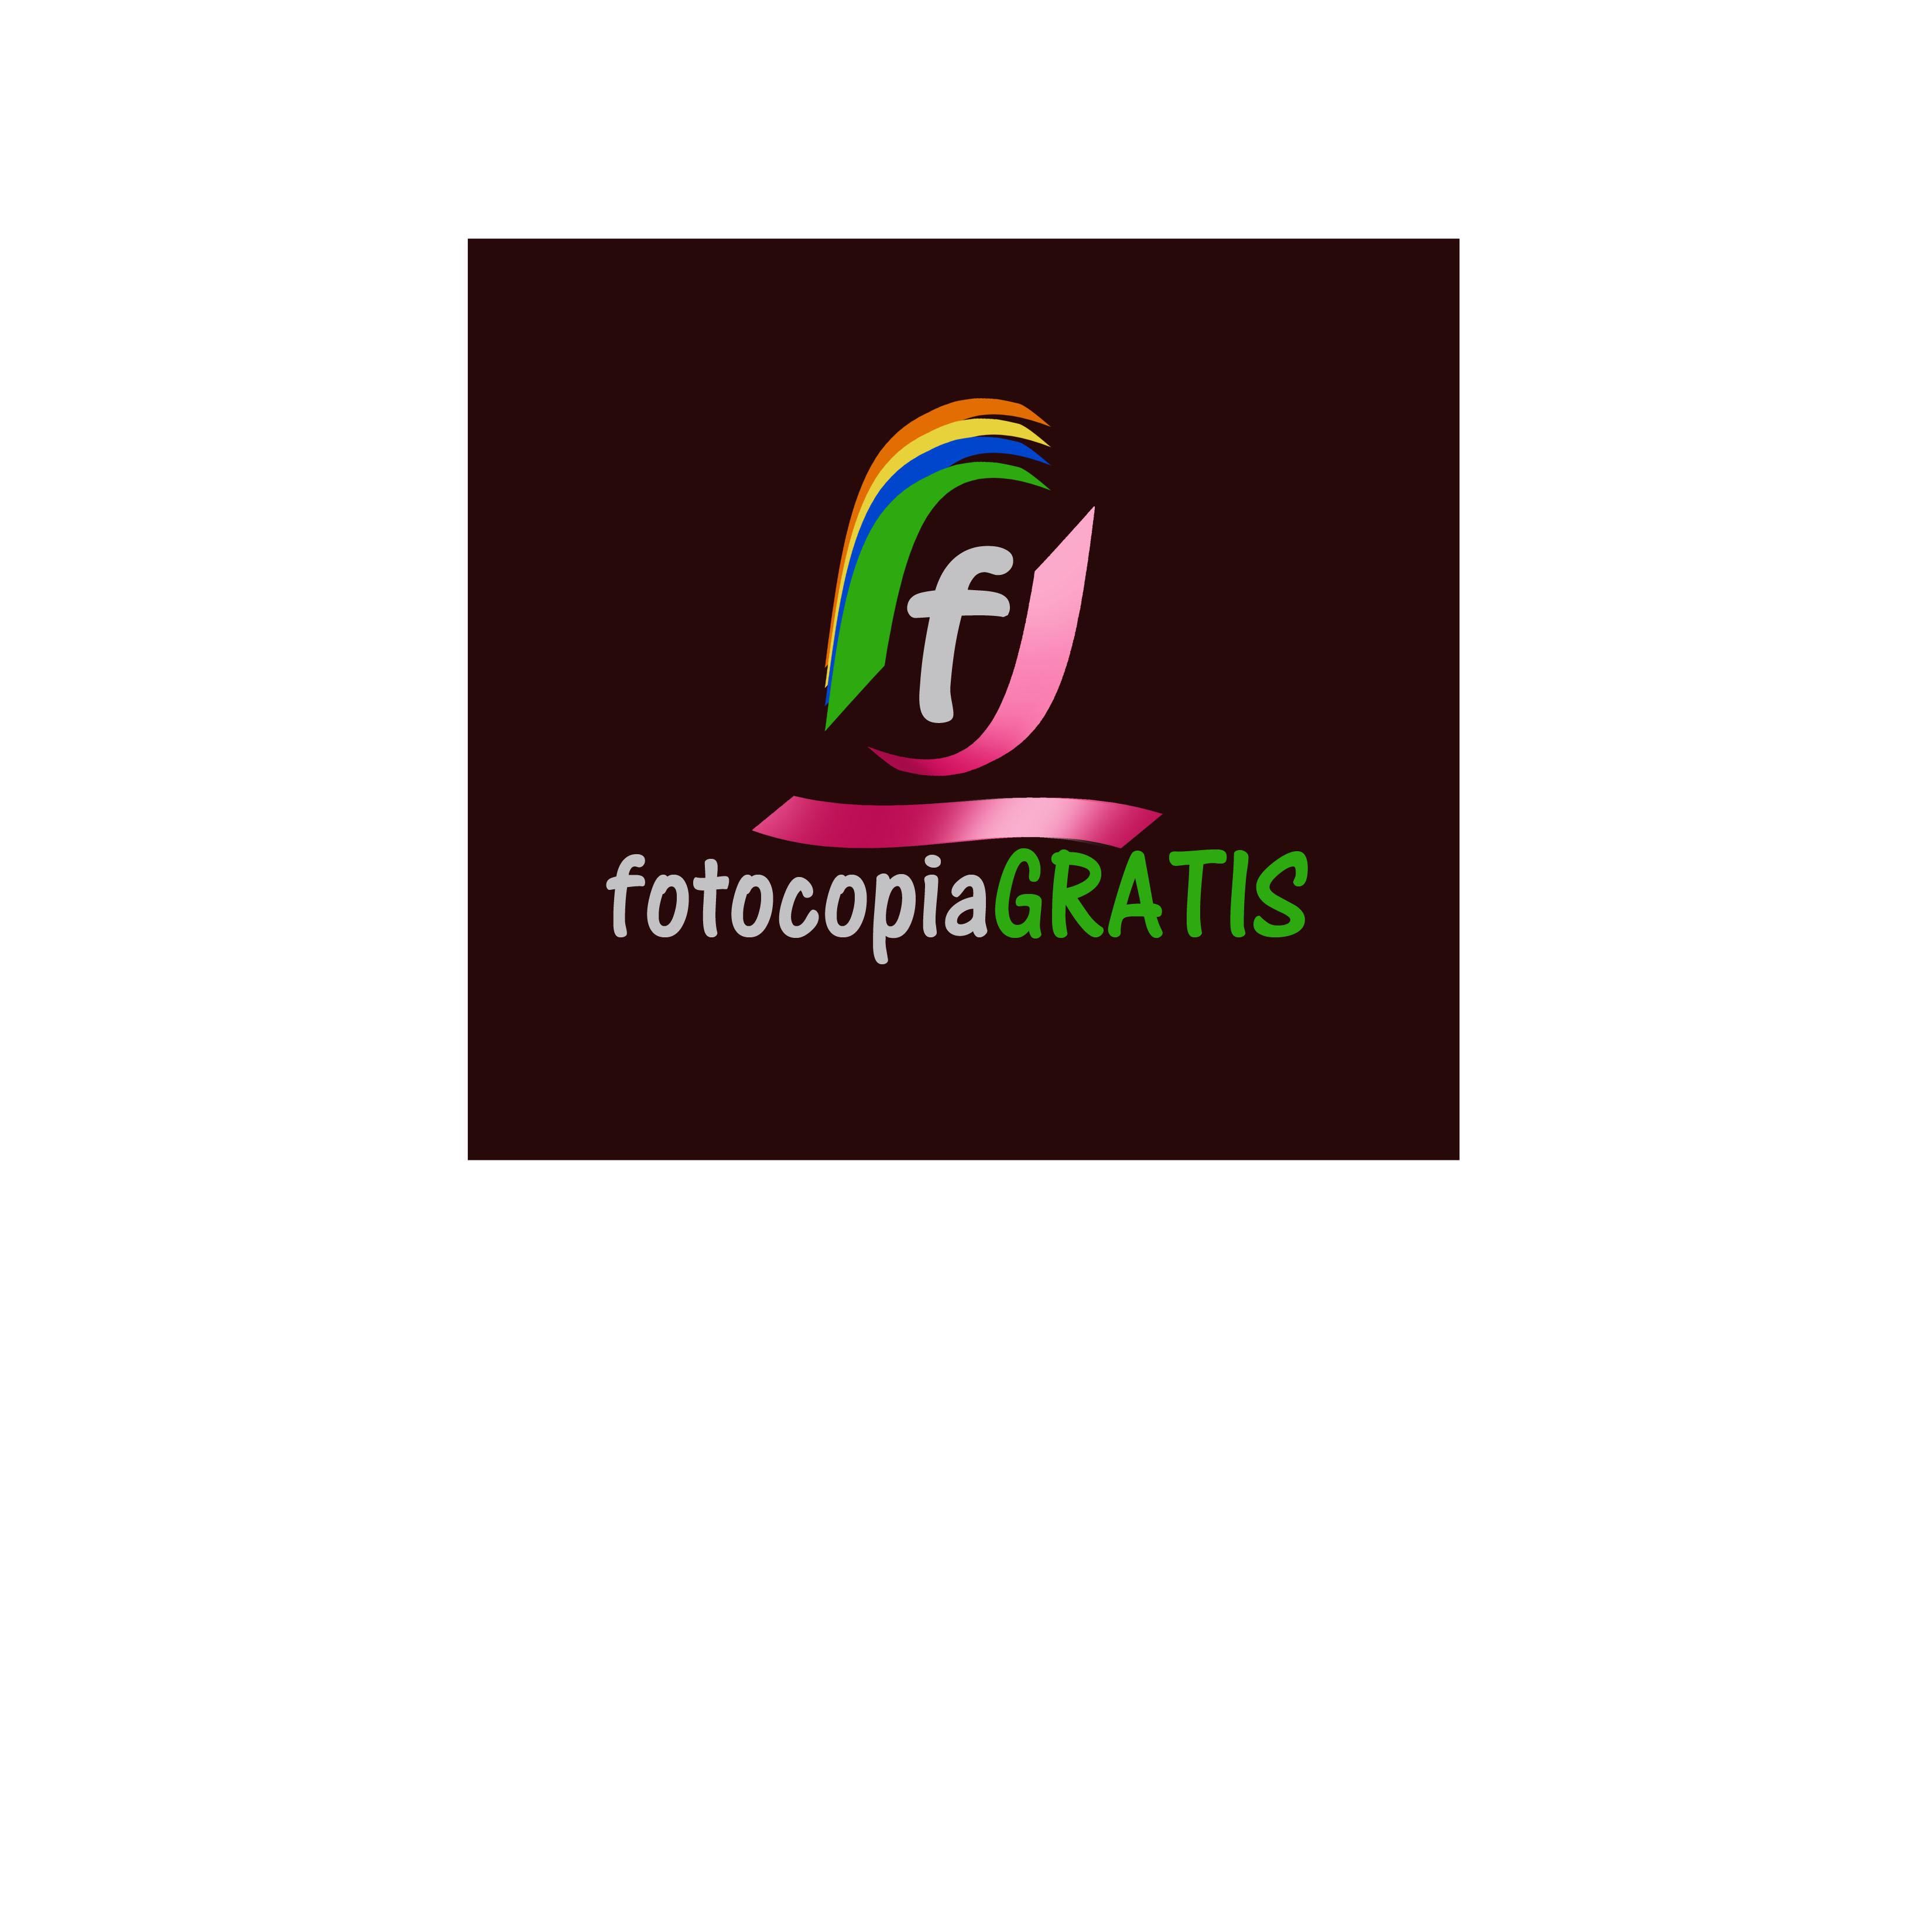 Logo Design by Alan Esclamado - Entry No. 64 in the Logo Design Contest Inspiring Logo Design for Fotocopiagratis.